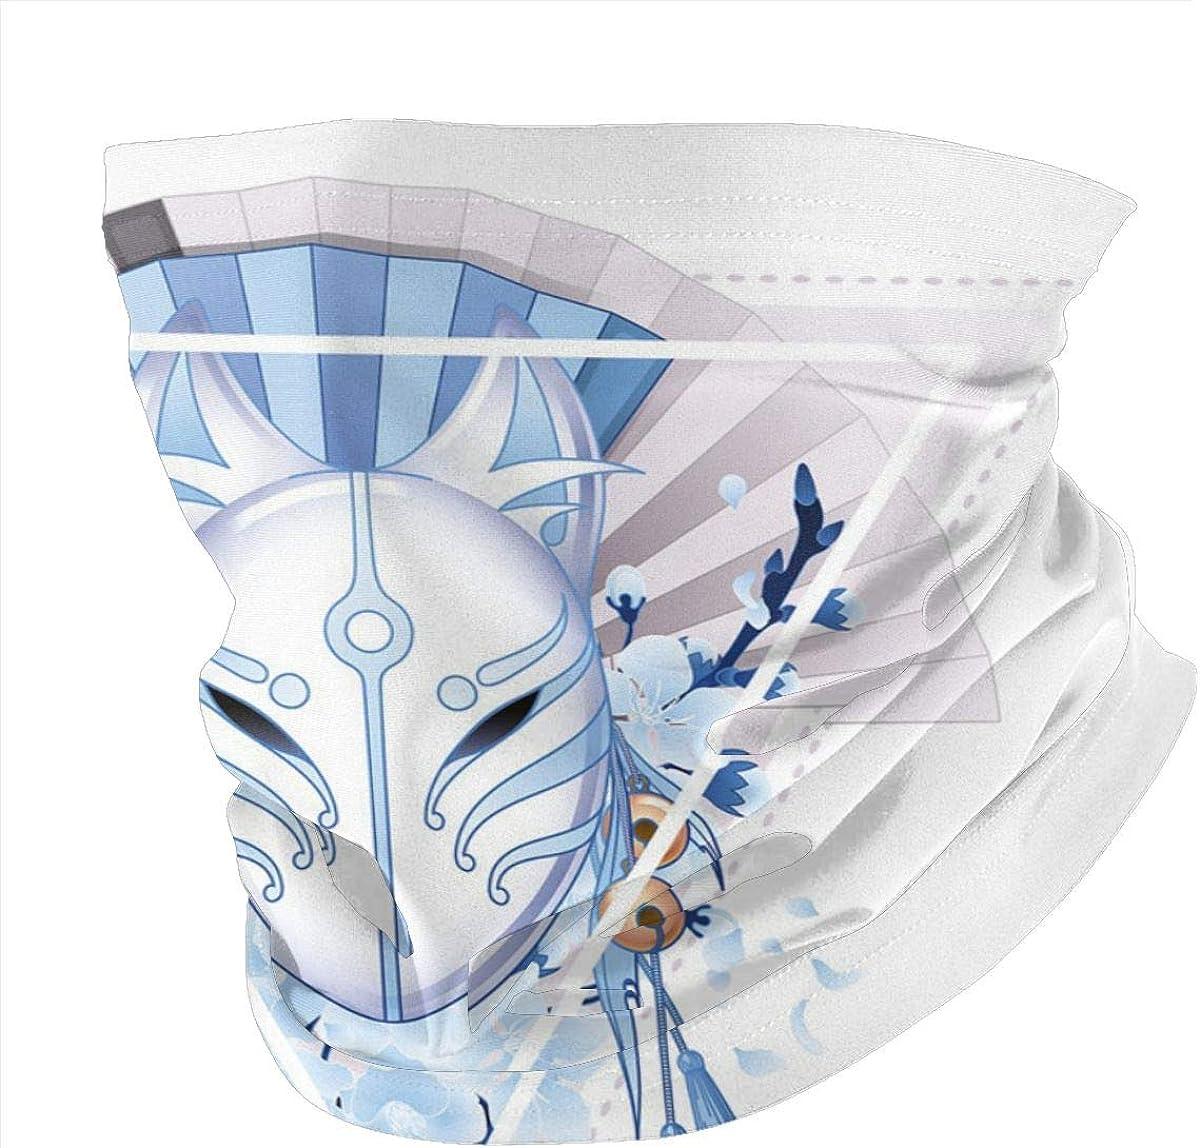 Roupaze Adult Neck Warmer Gaiters Bandana Kabuki Mask Fox Mask Kitsune Japan Culture Theme with Triangle Sakura Flowers Pale Blue White Beige Balaclava Scarf Cap Hairband for Unisex